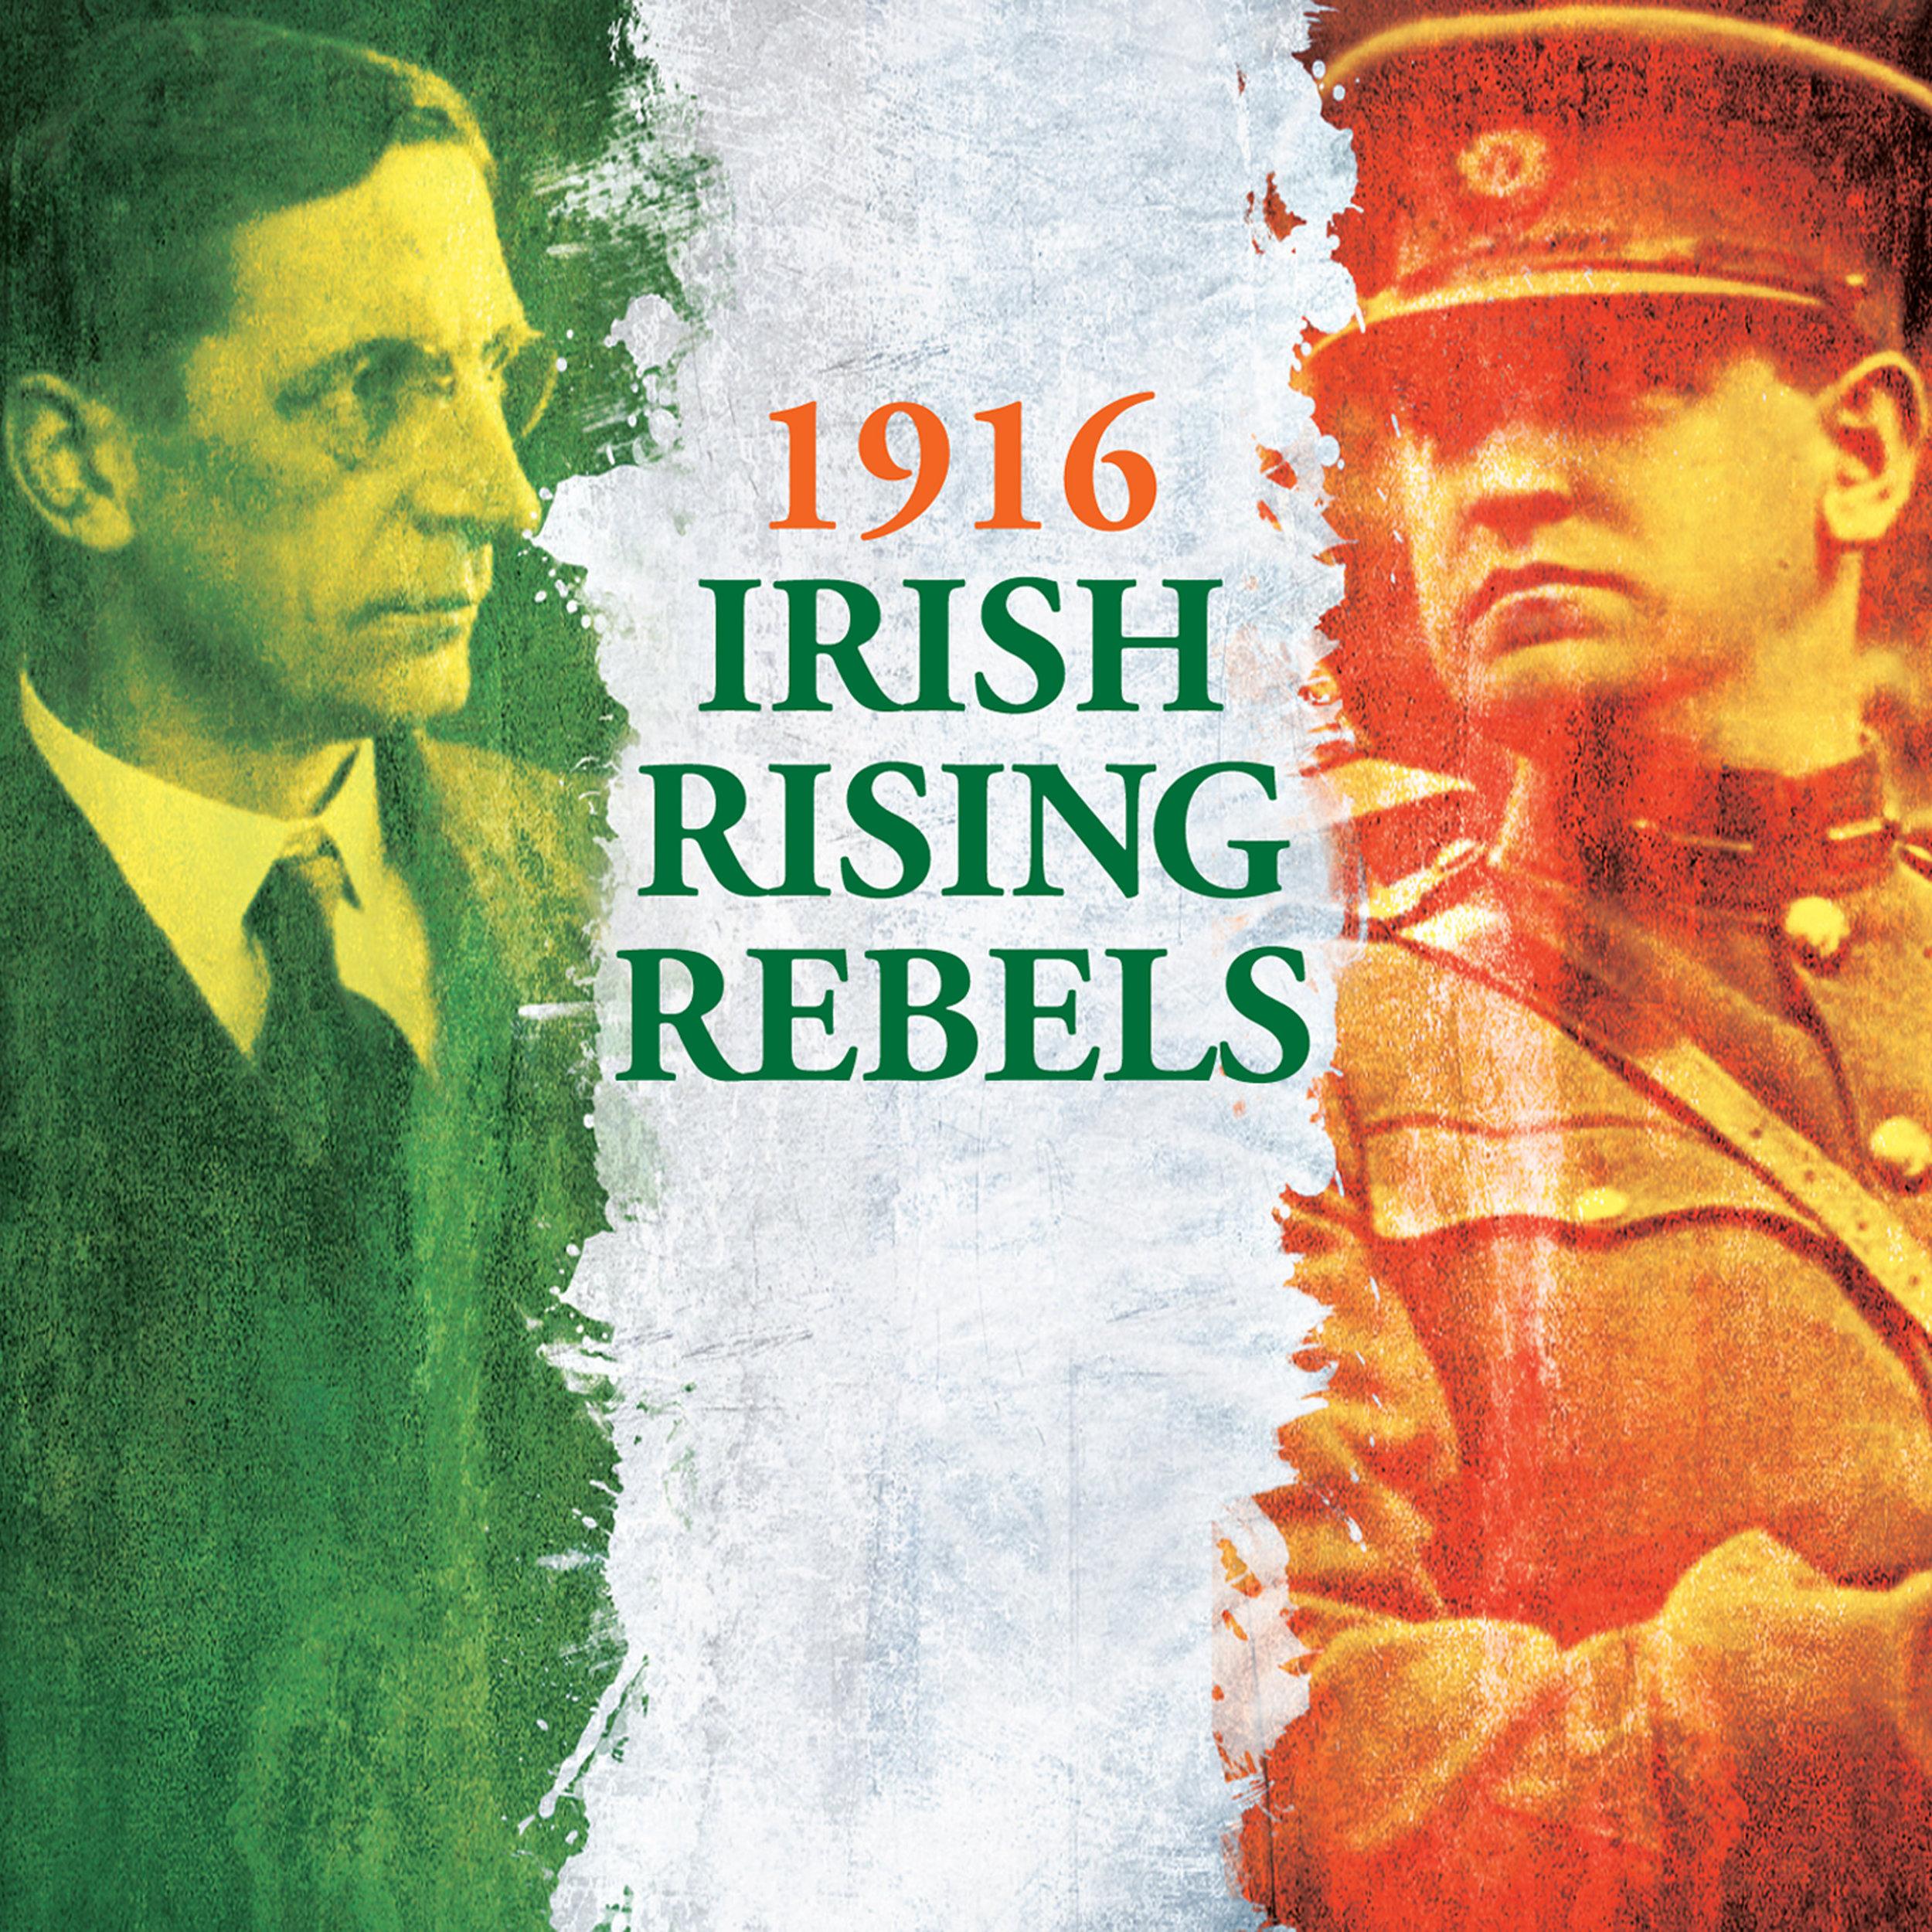 1916 Irish Rebels Rising.jpg